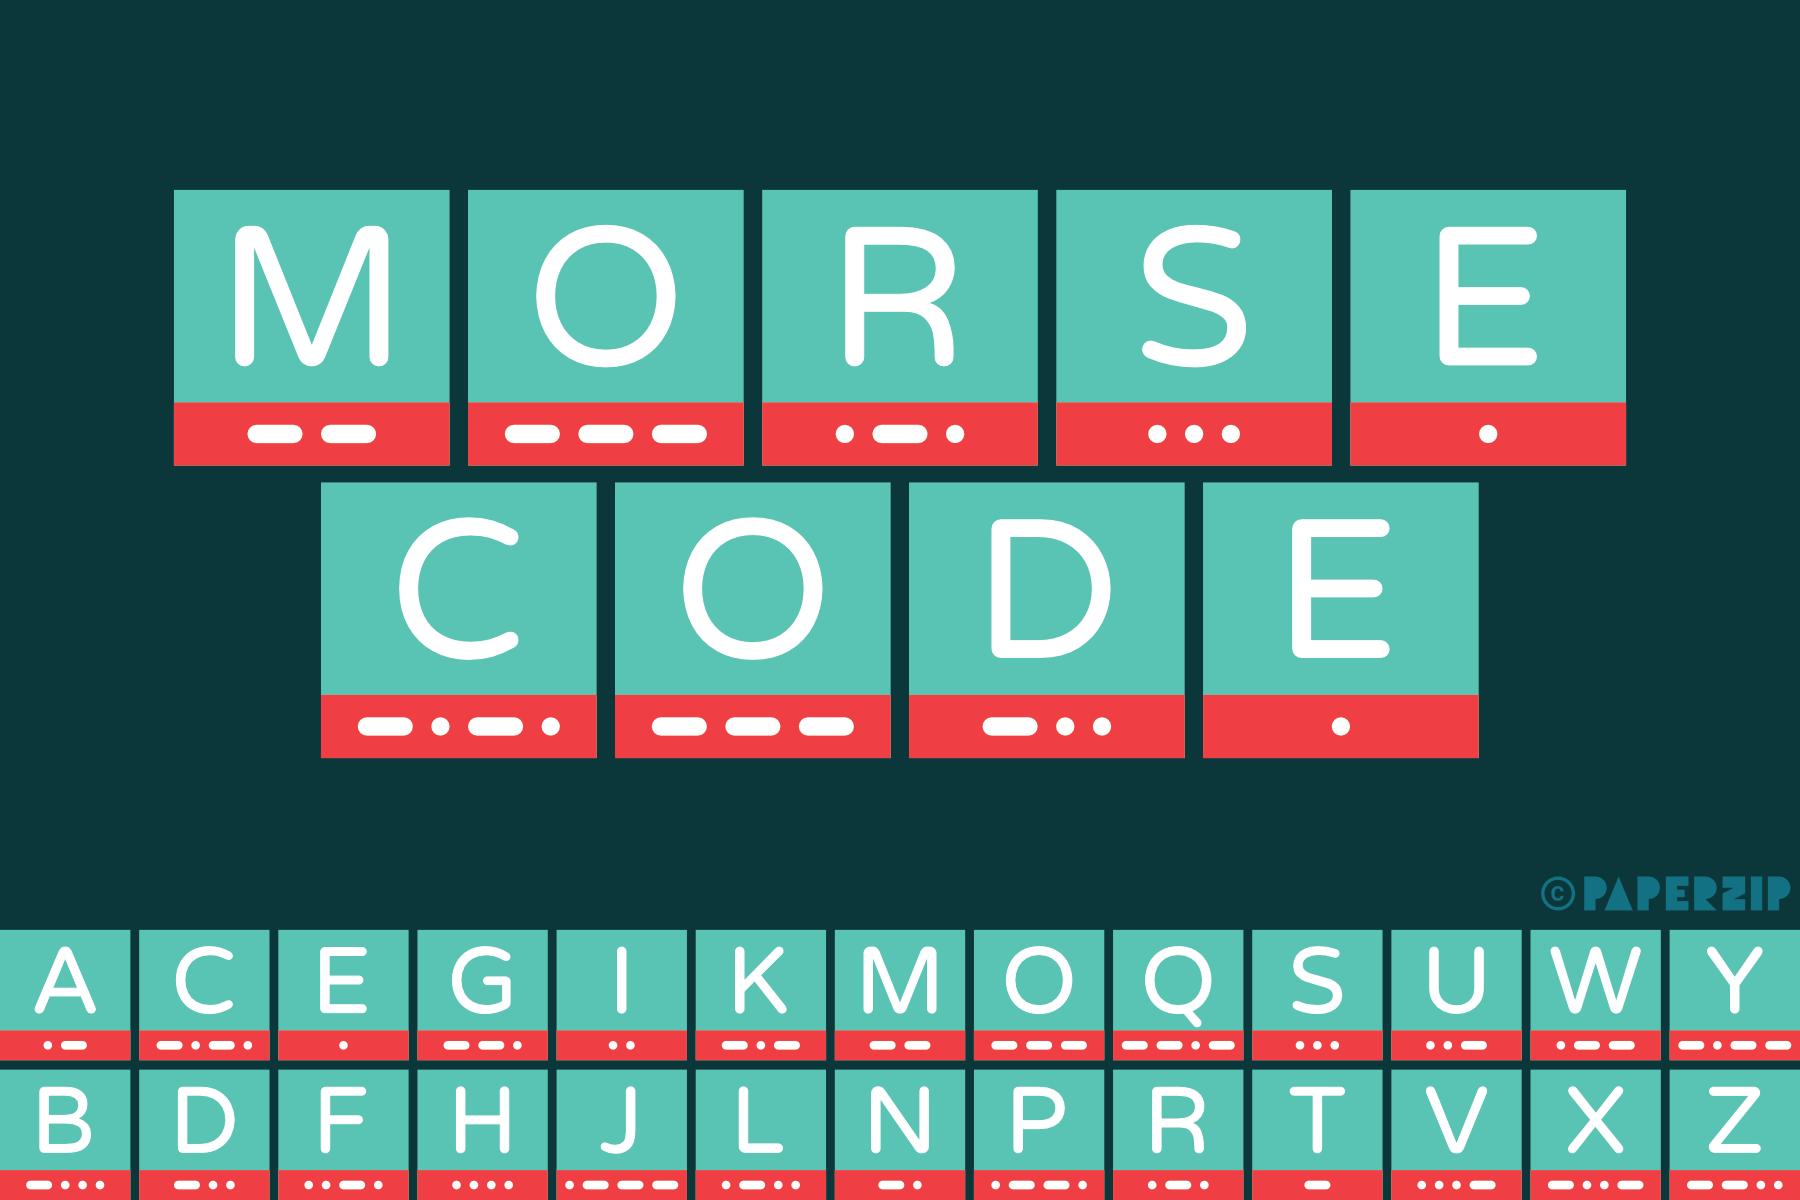 photo about Morse Code Printable titled Morse Code Alphabet - PAPERZIP